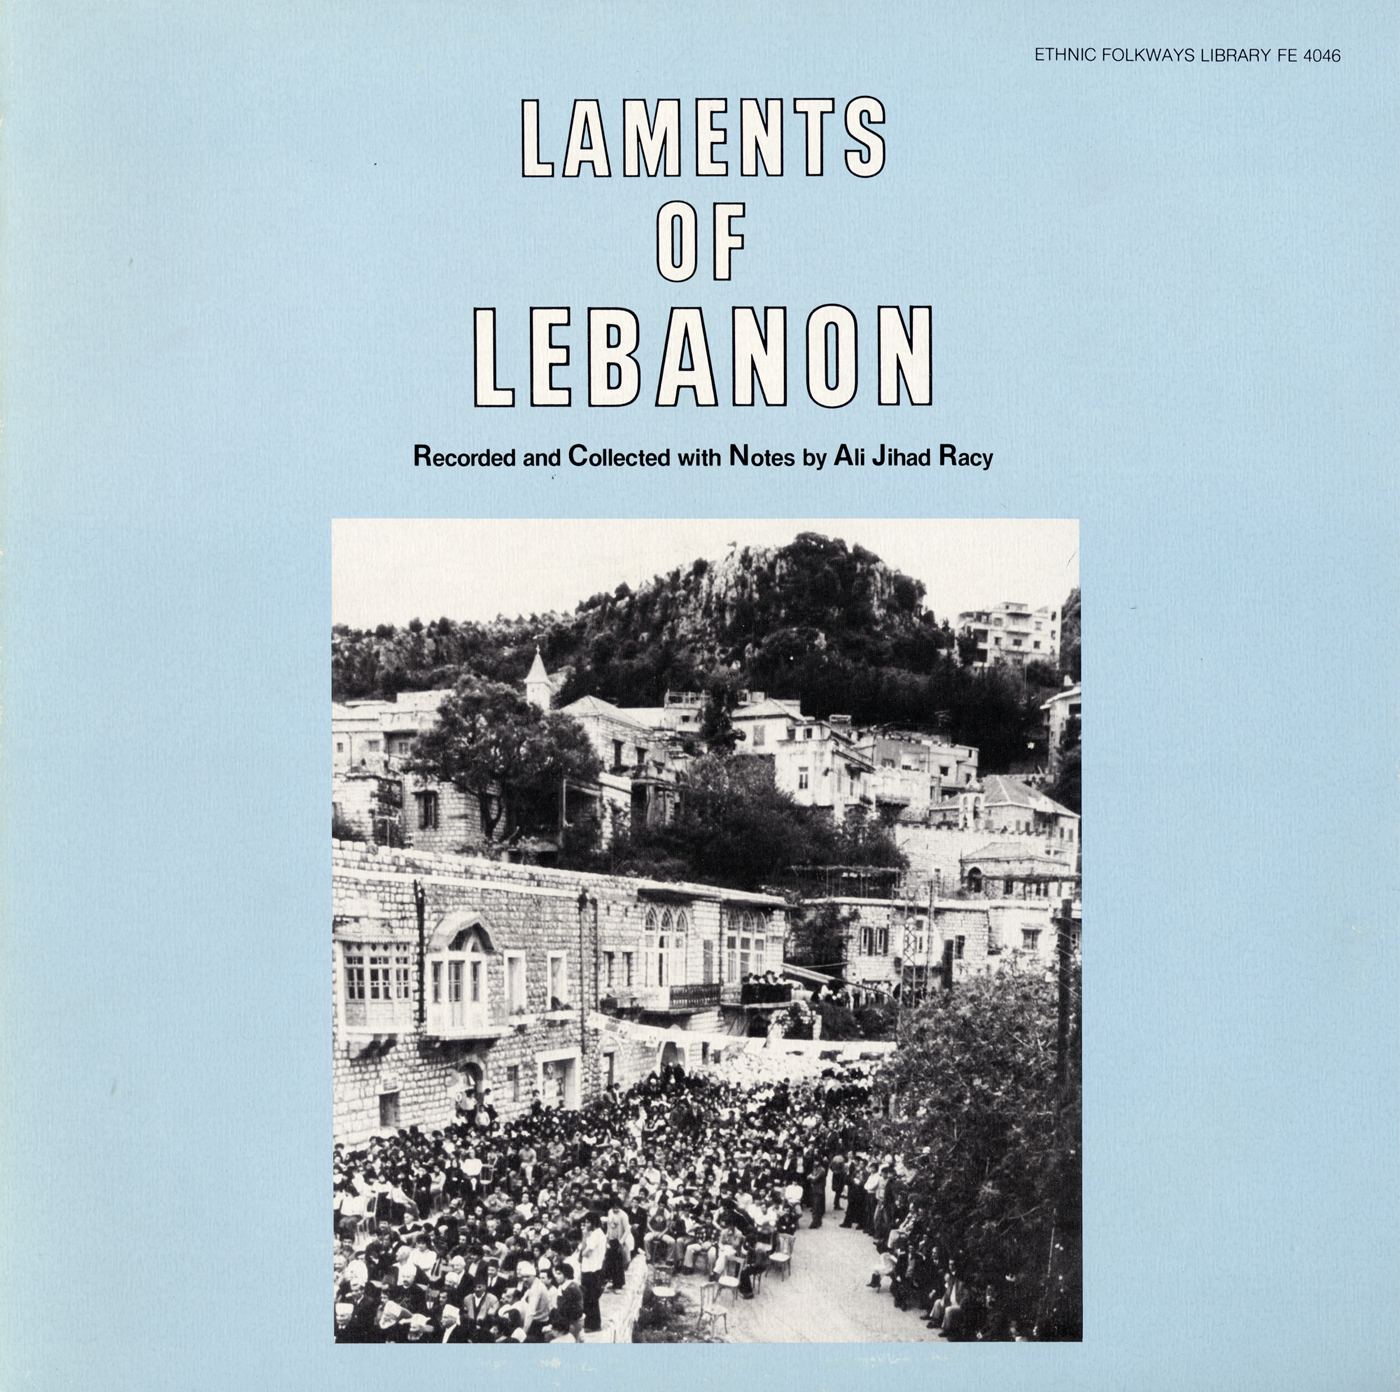 Laments of Lebanon - Funeral Laments of Lebanon | Smithsonian